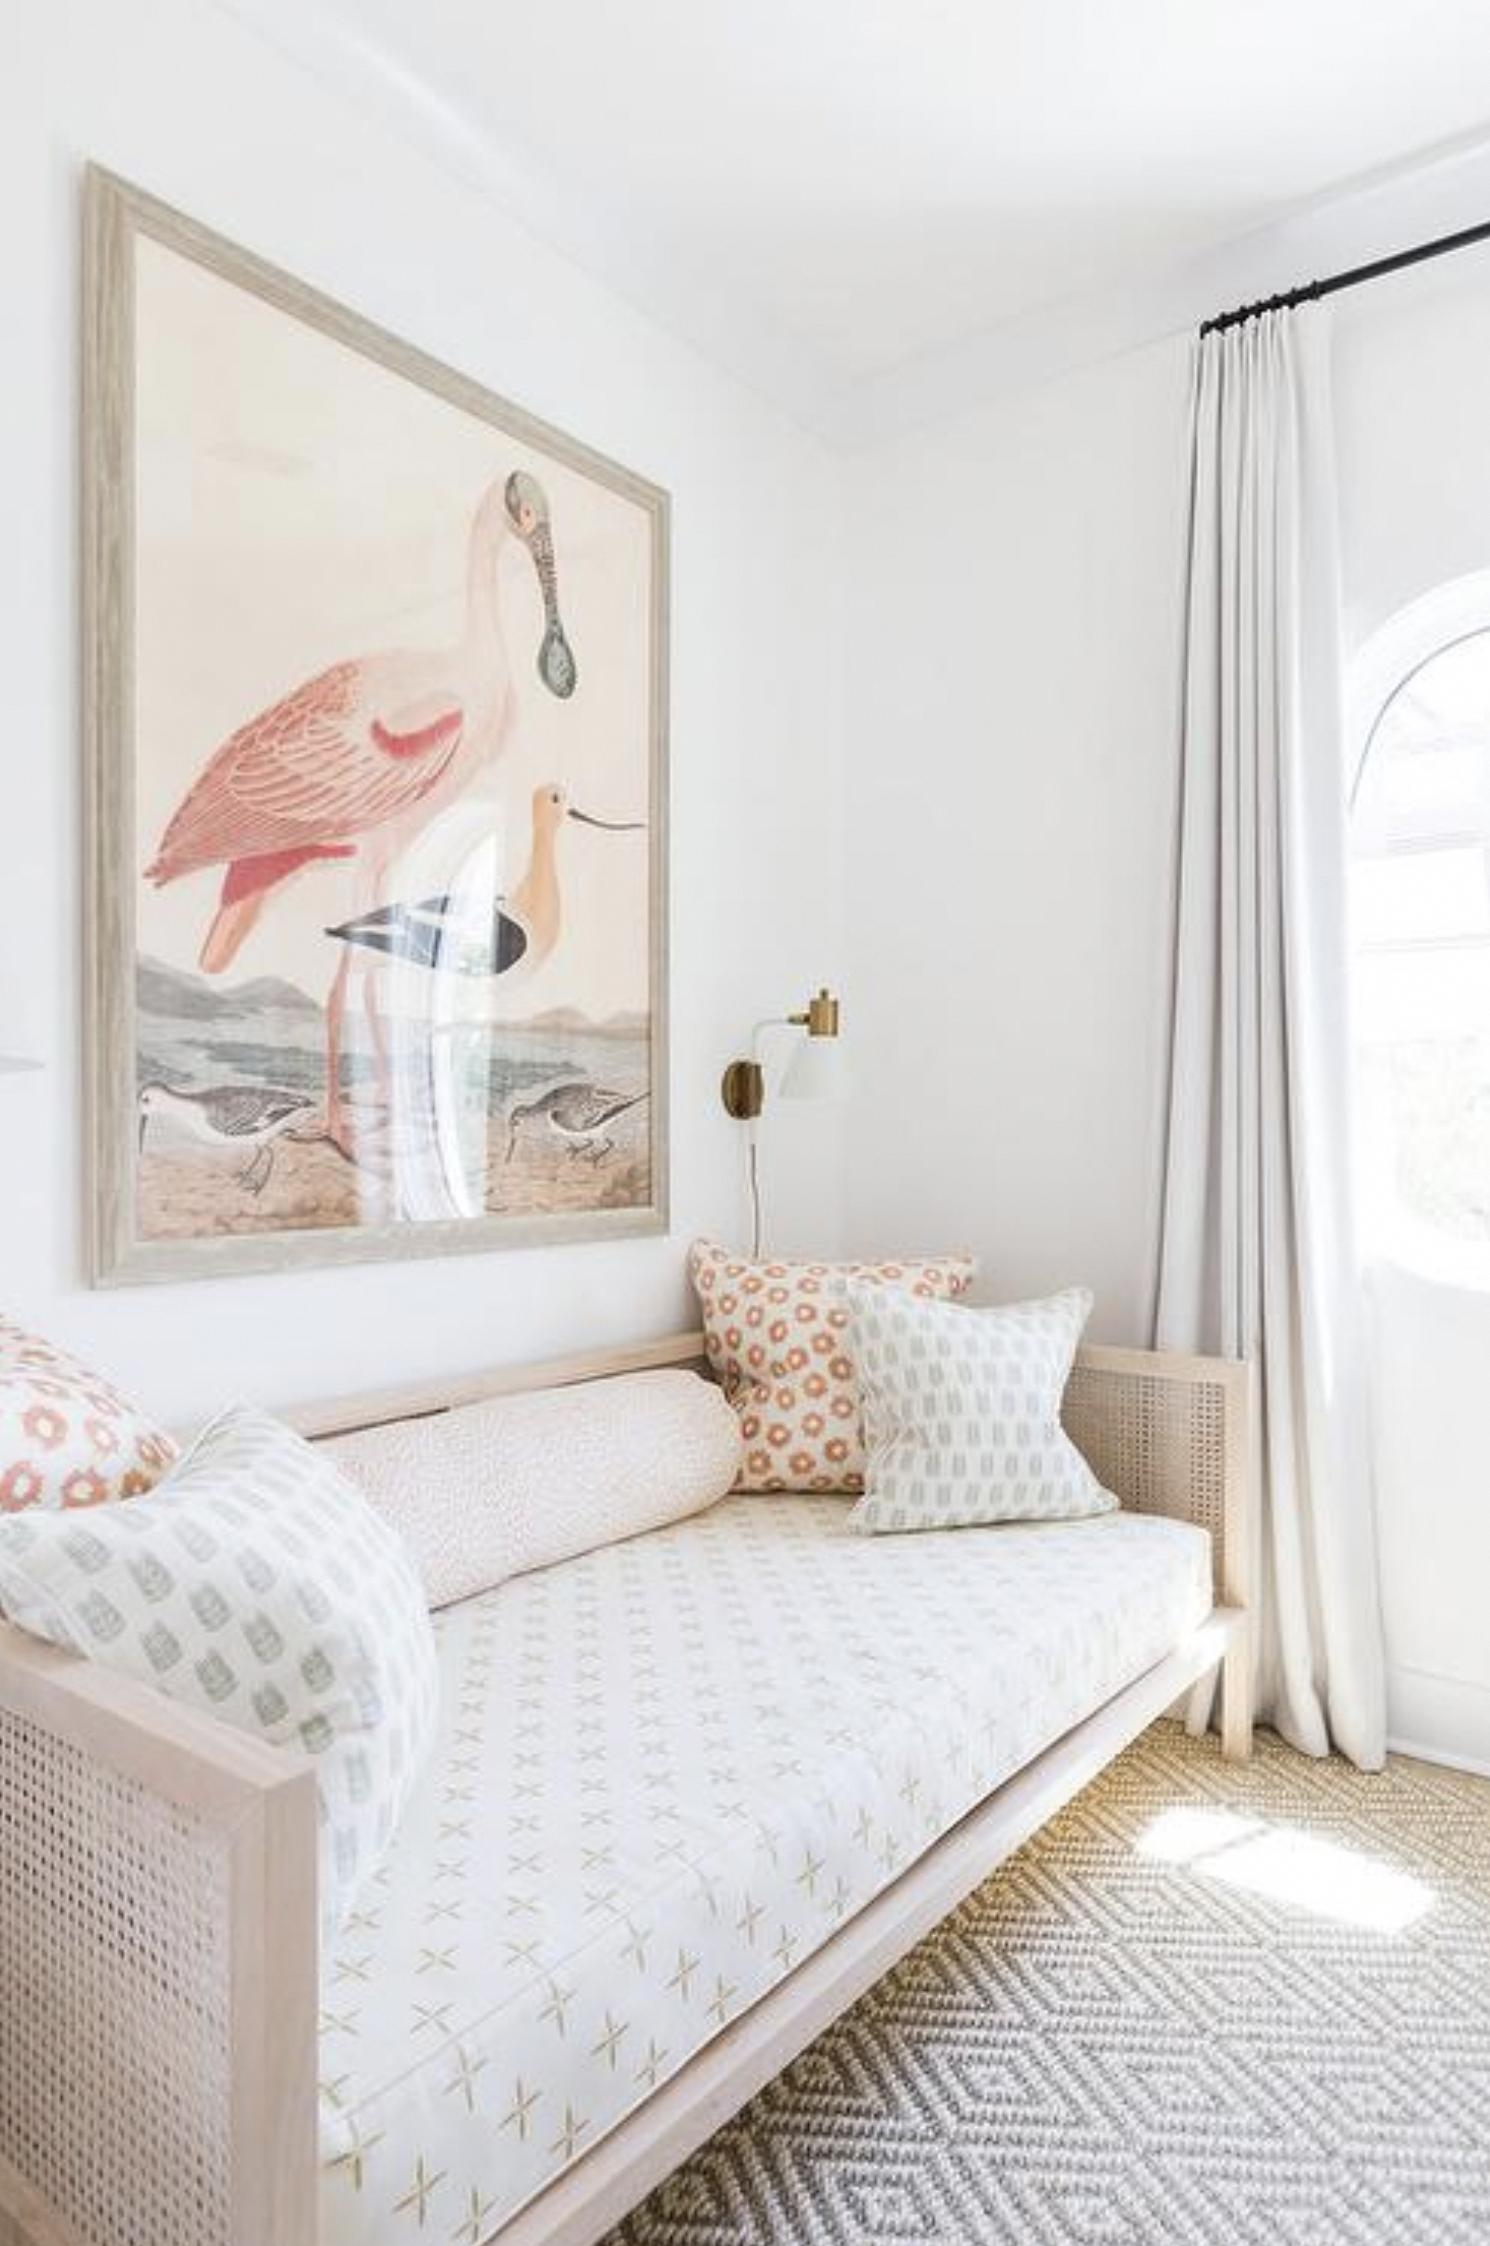 Cheapest Furniture Rental Shippingfurnitureonetsy In 2019